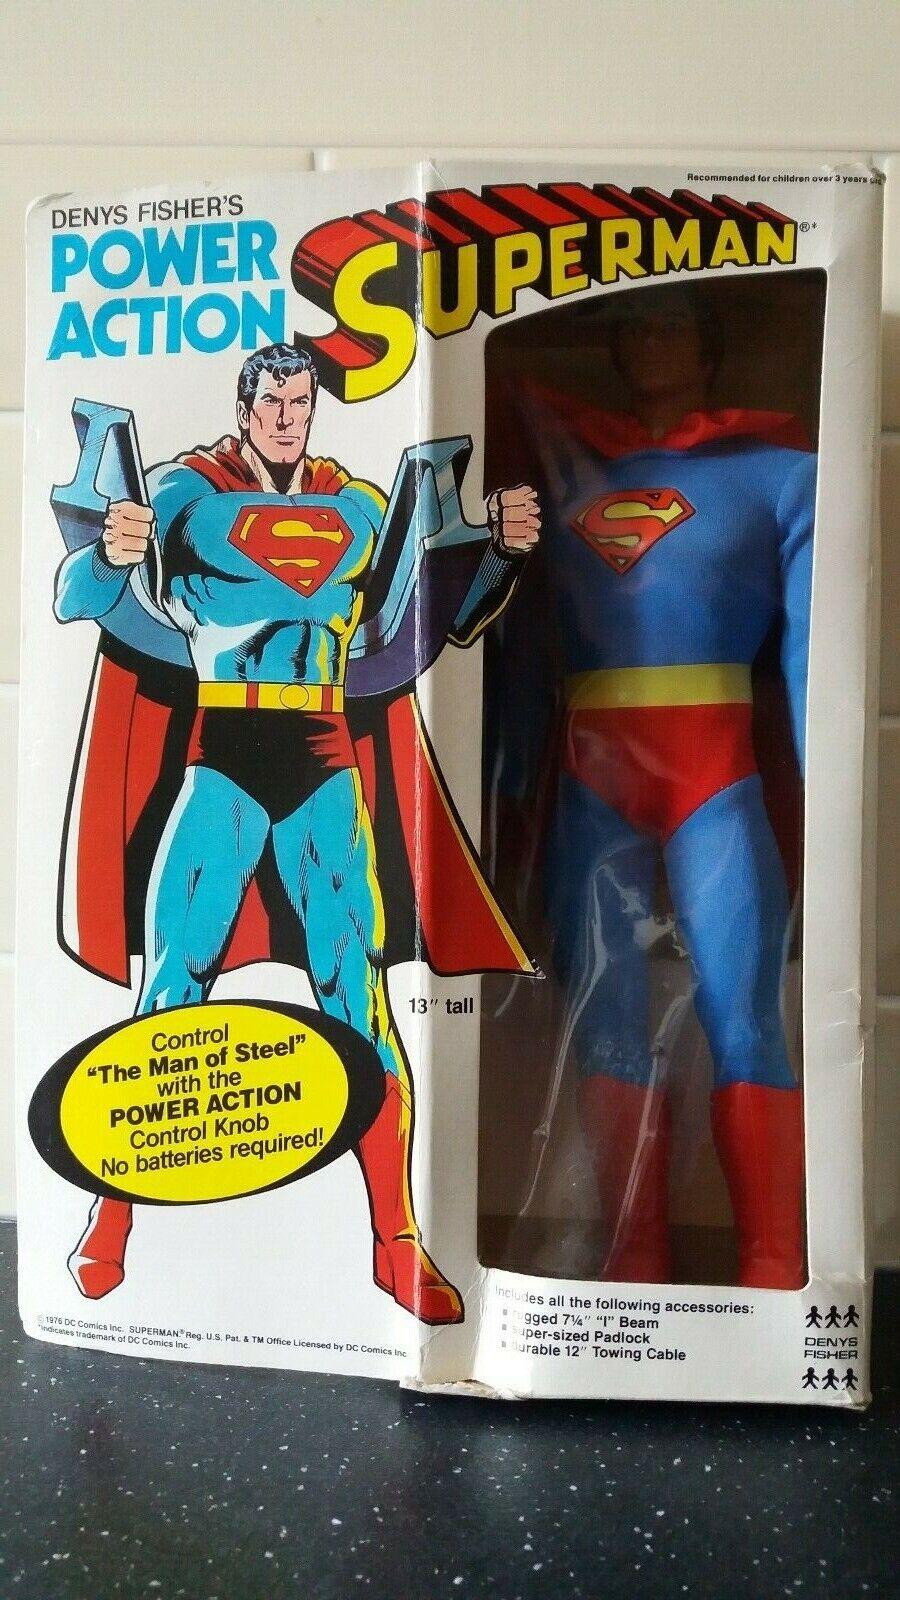 Denys fisher's power action superman vintage figure